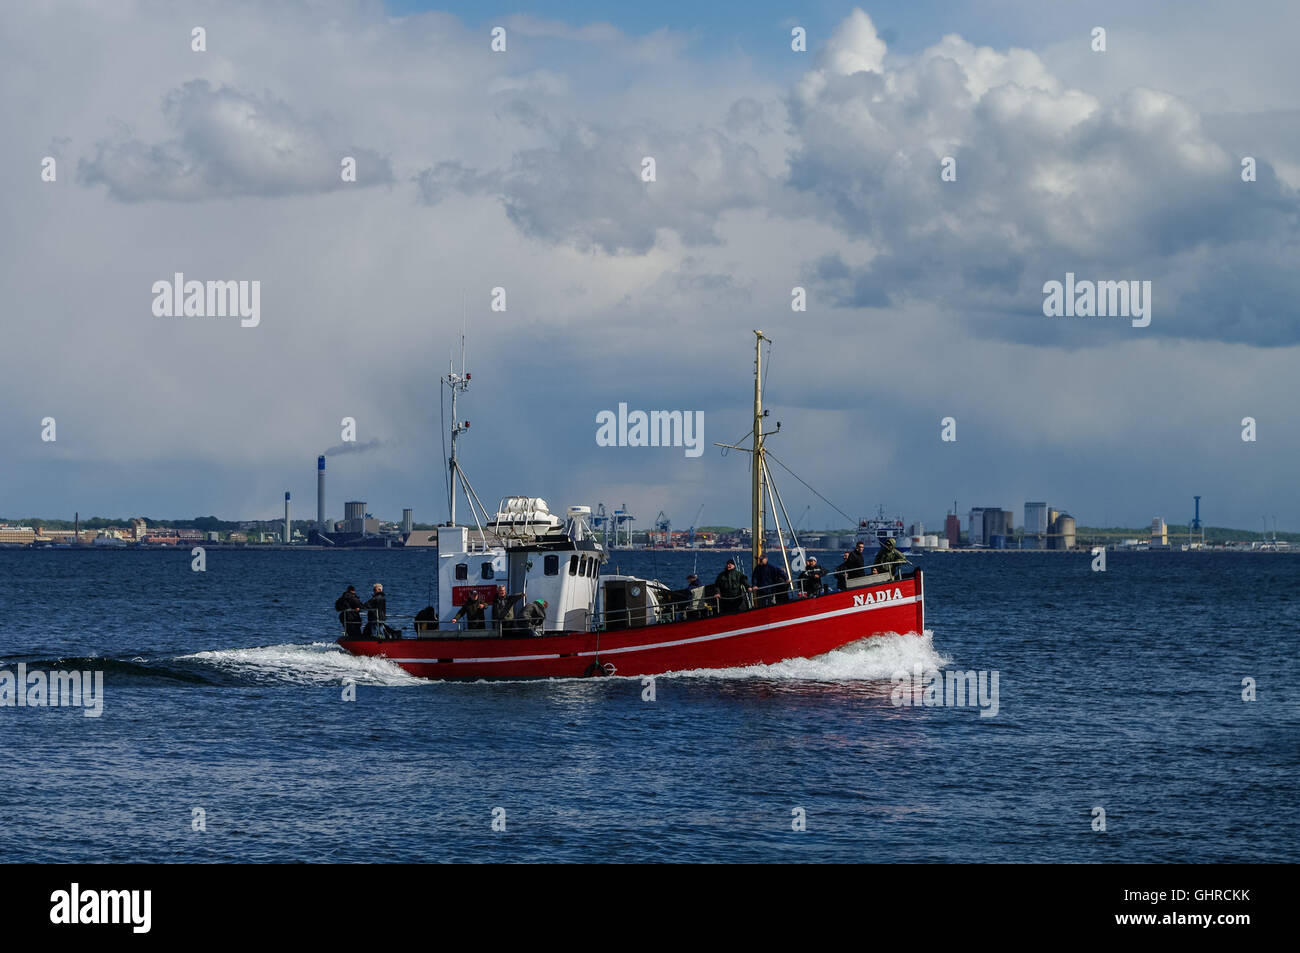 Helsingborg, Denmark  - 1 may 2011: Fishing boat near Helsingborg city in strait between  Denmark and Sweden. - Stock Image